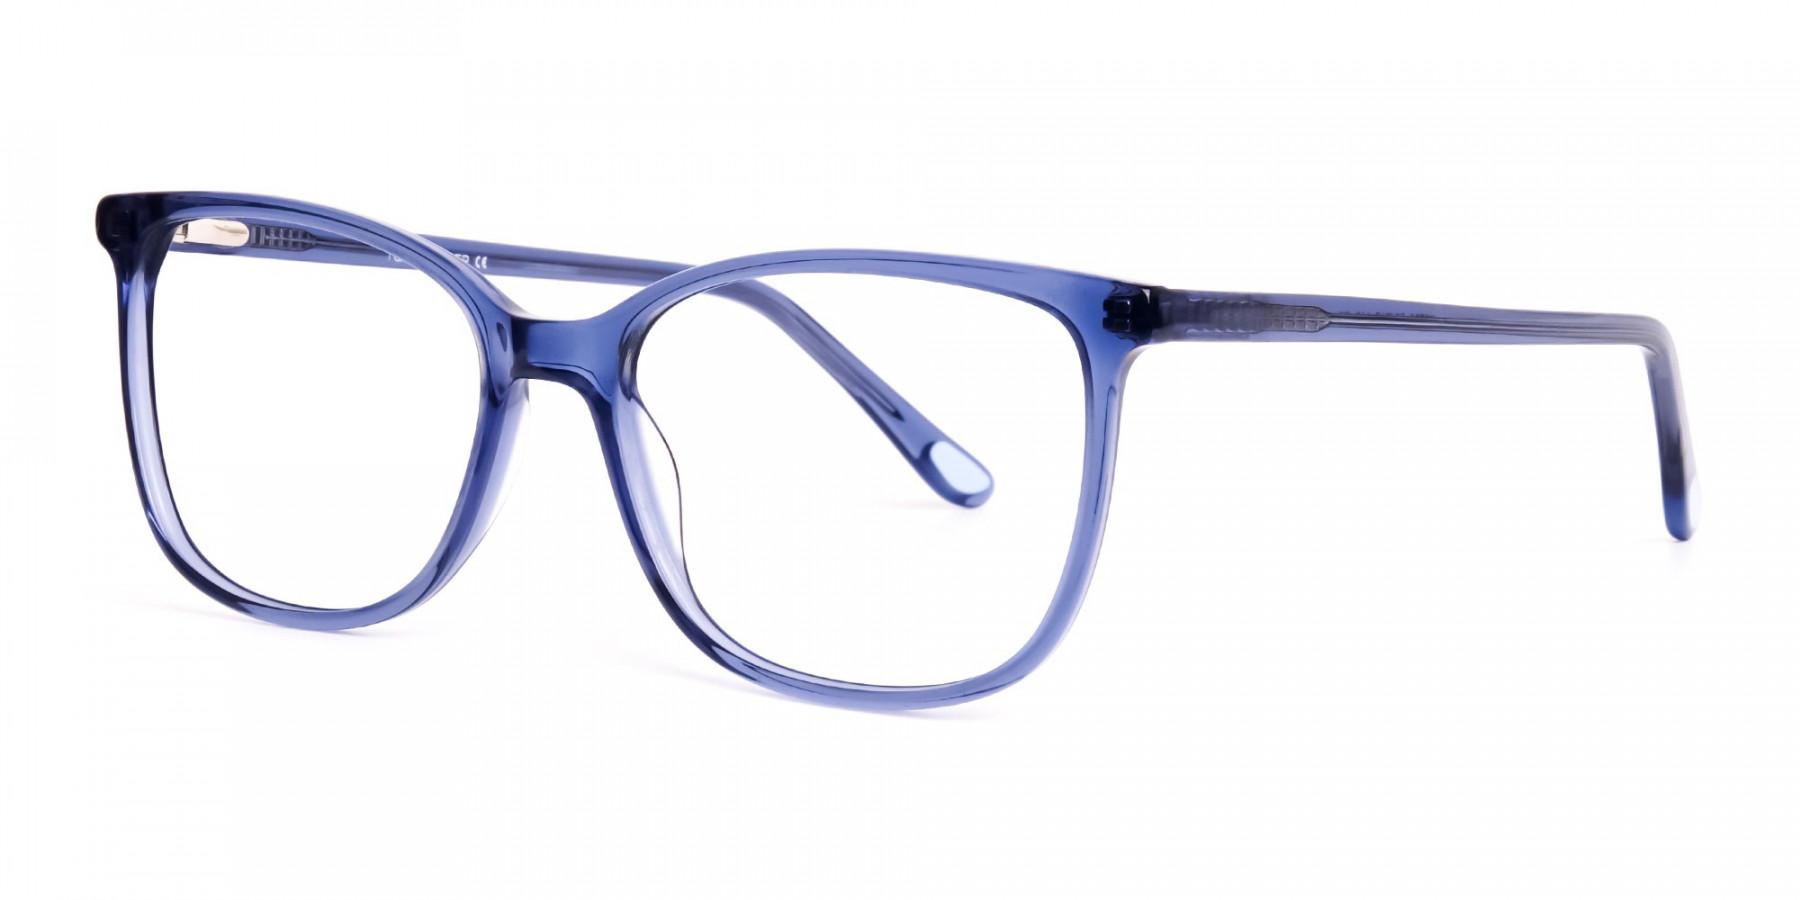 crystal-clear-and-transparent-blue-wayfarer-cateye-glasses-frames-1